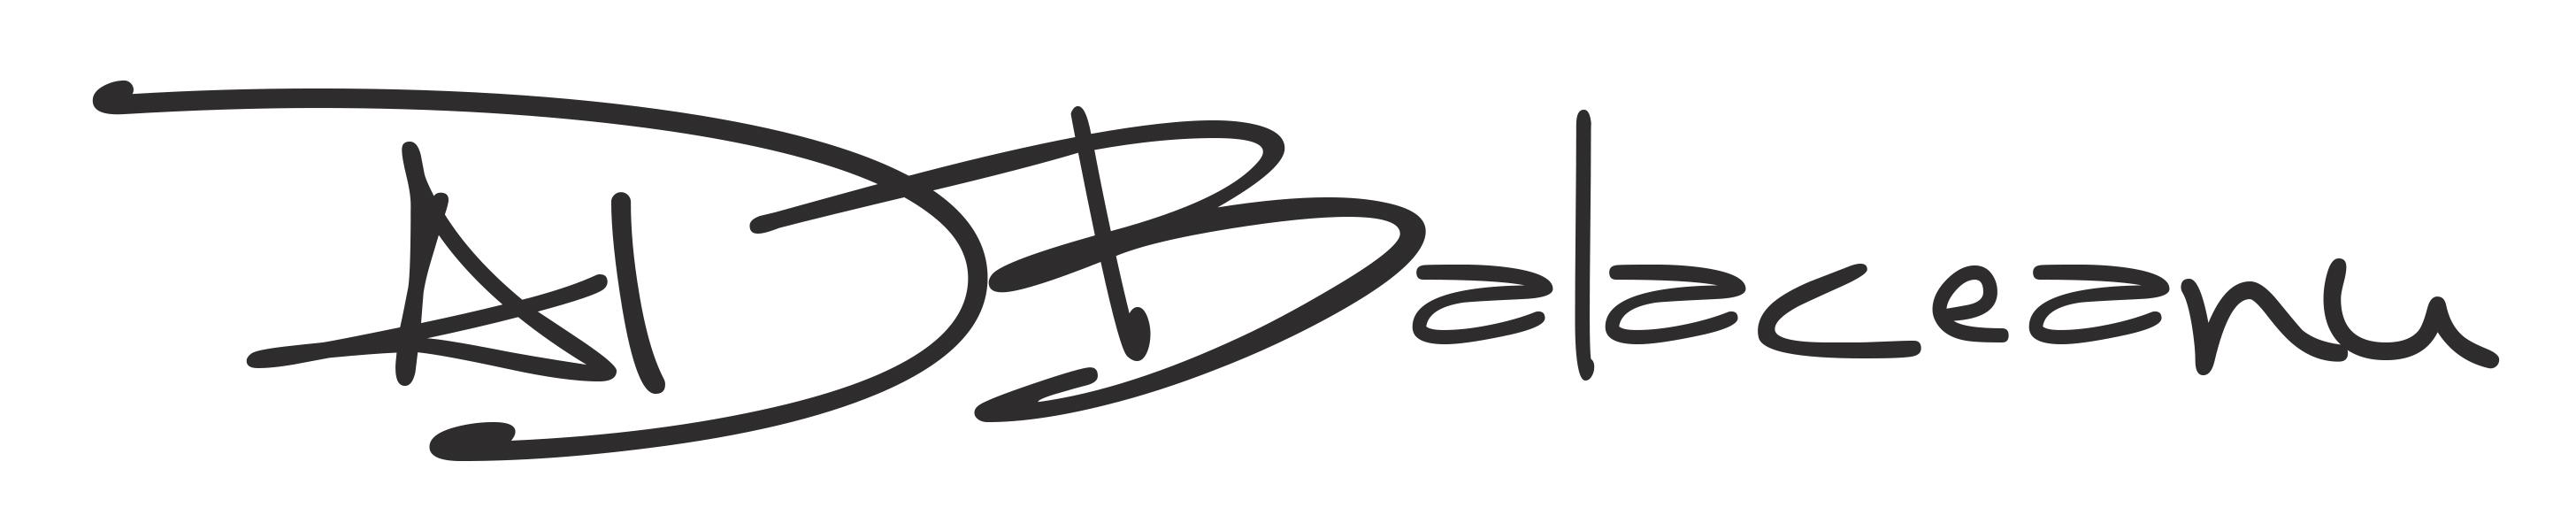 Alin Daniel Balaceanu's Signature